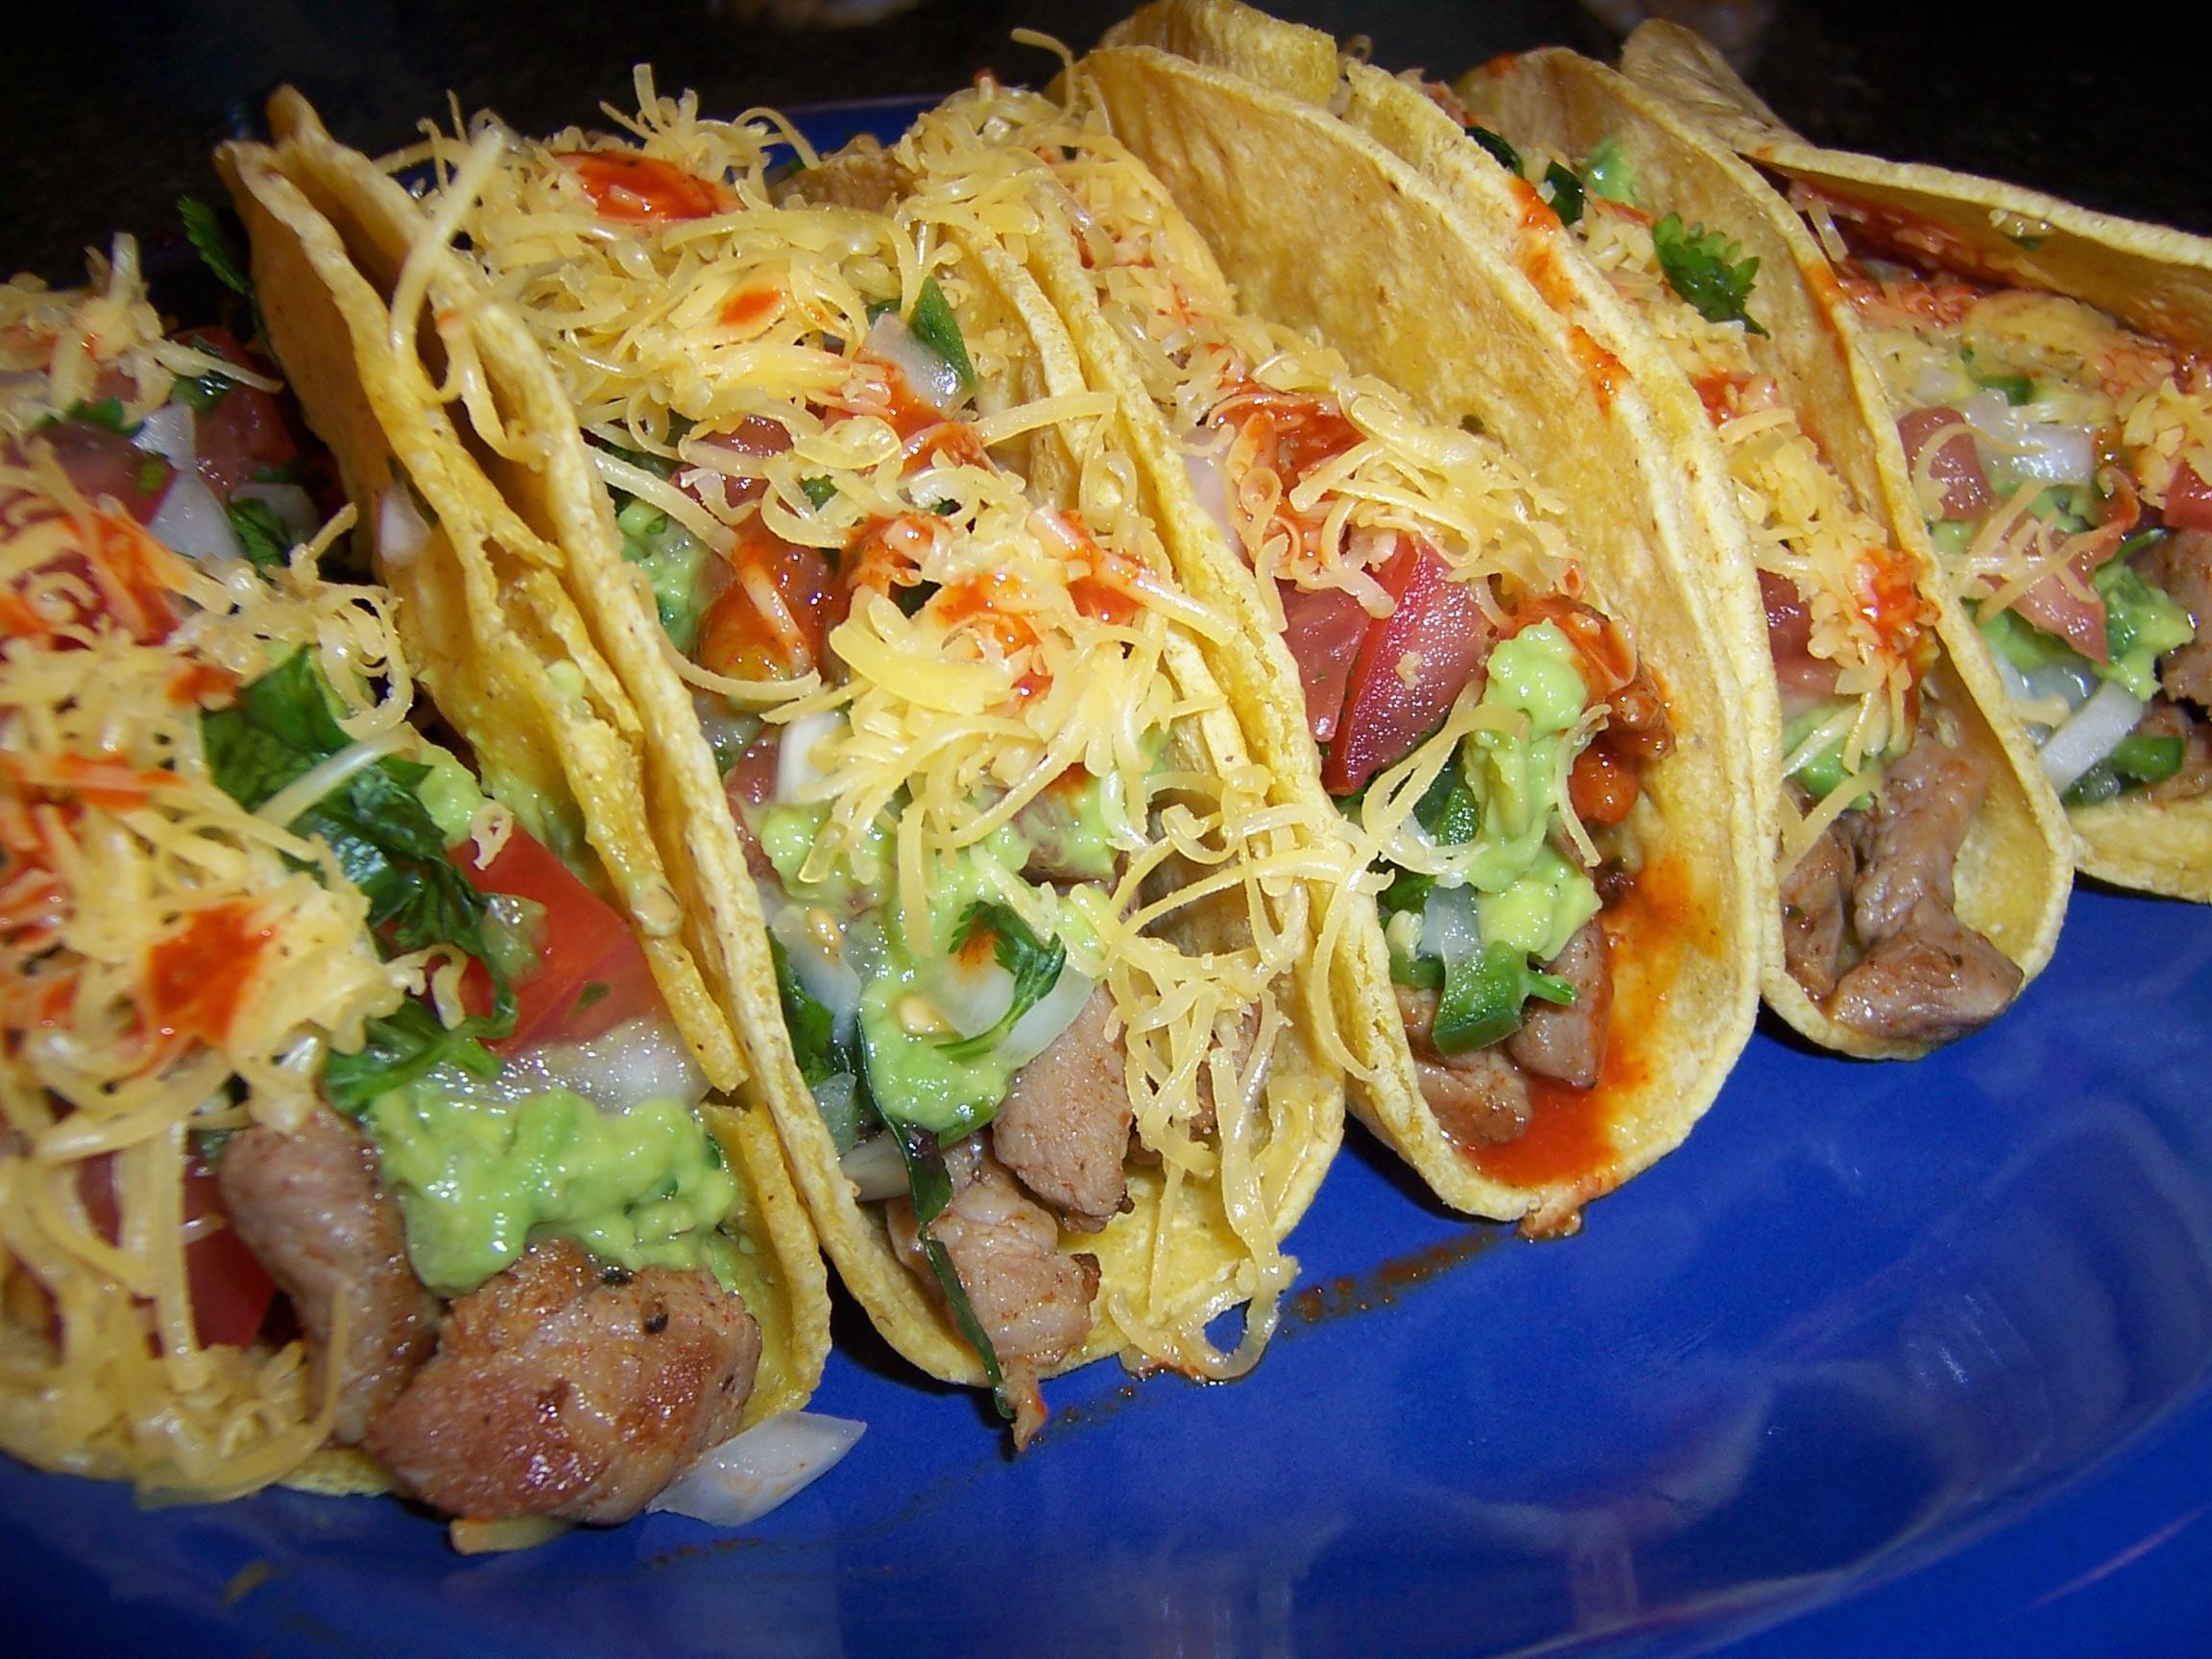 Taco HD Wallpaper | Background Image | 2304x1728 | ID ...